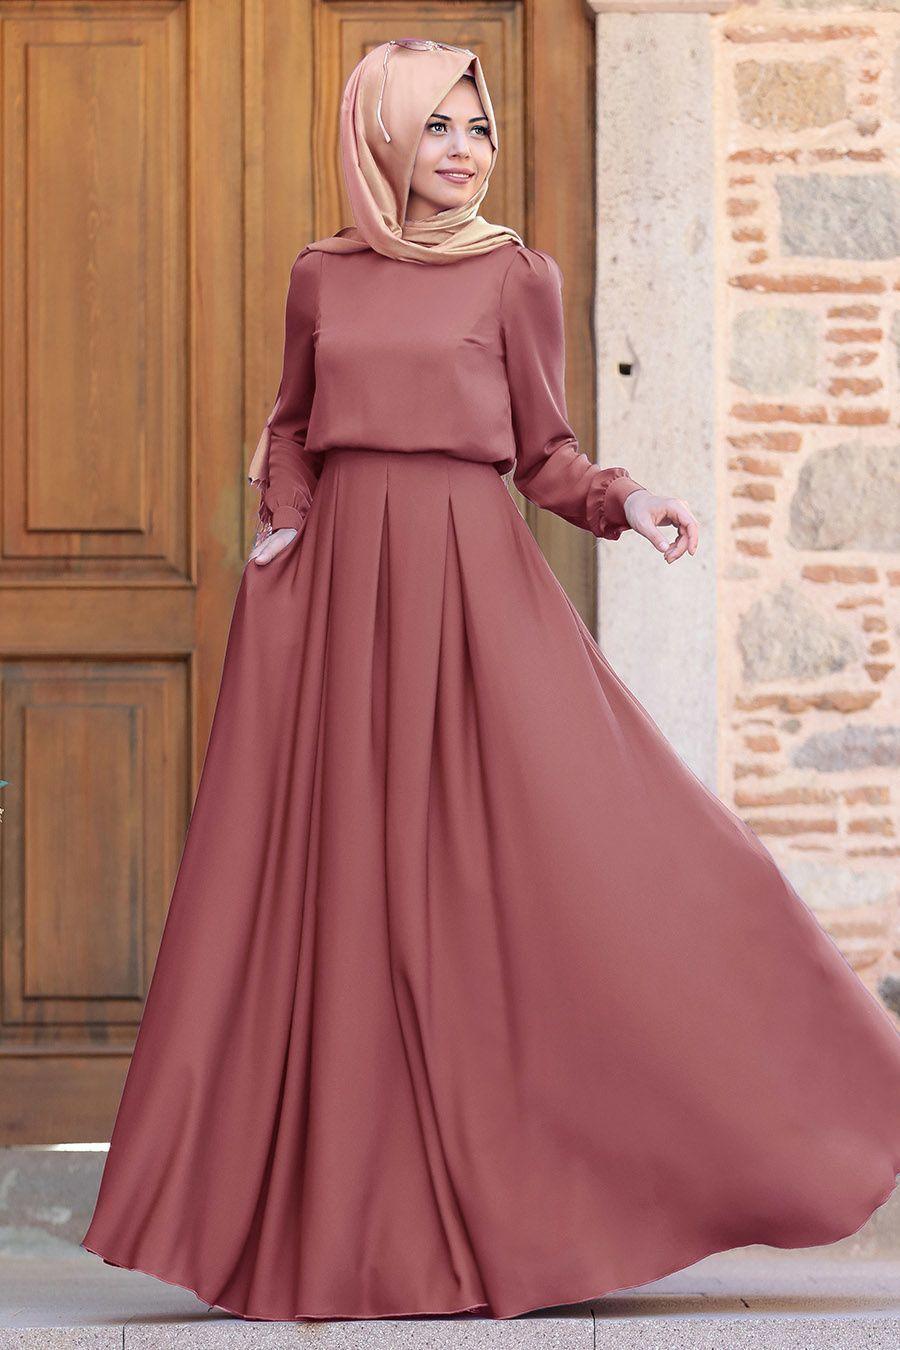 Tesetturlu Abiye Elbise Gulce Kiremit Tesettur Abiye Elbise 6753krmt Tesettur Modelleri 2020 In 2020 Muslim Fashion Outfits Muslim Dress Muslim Fashion